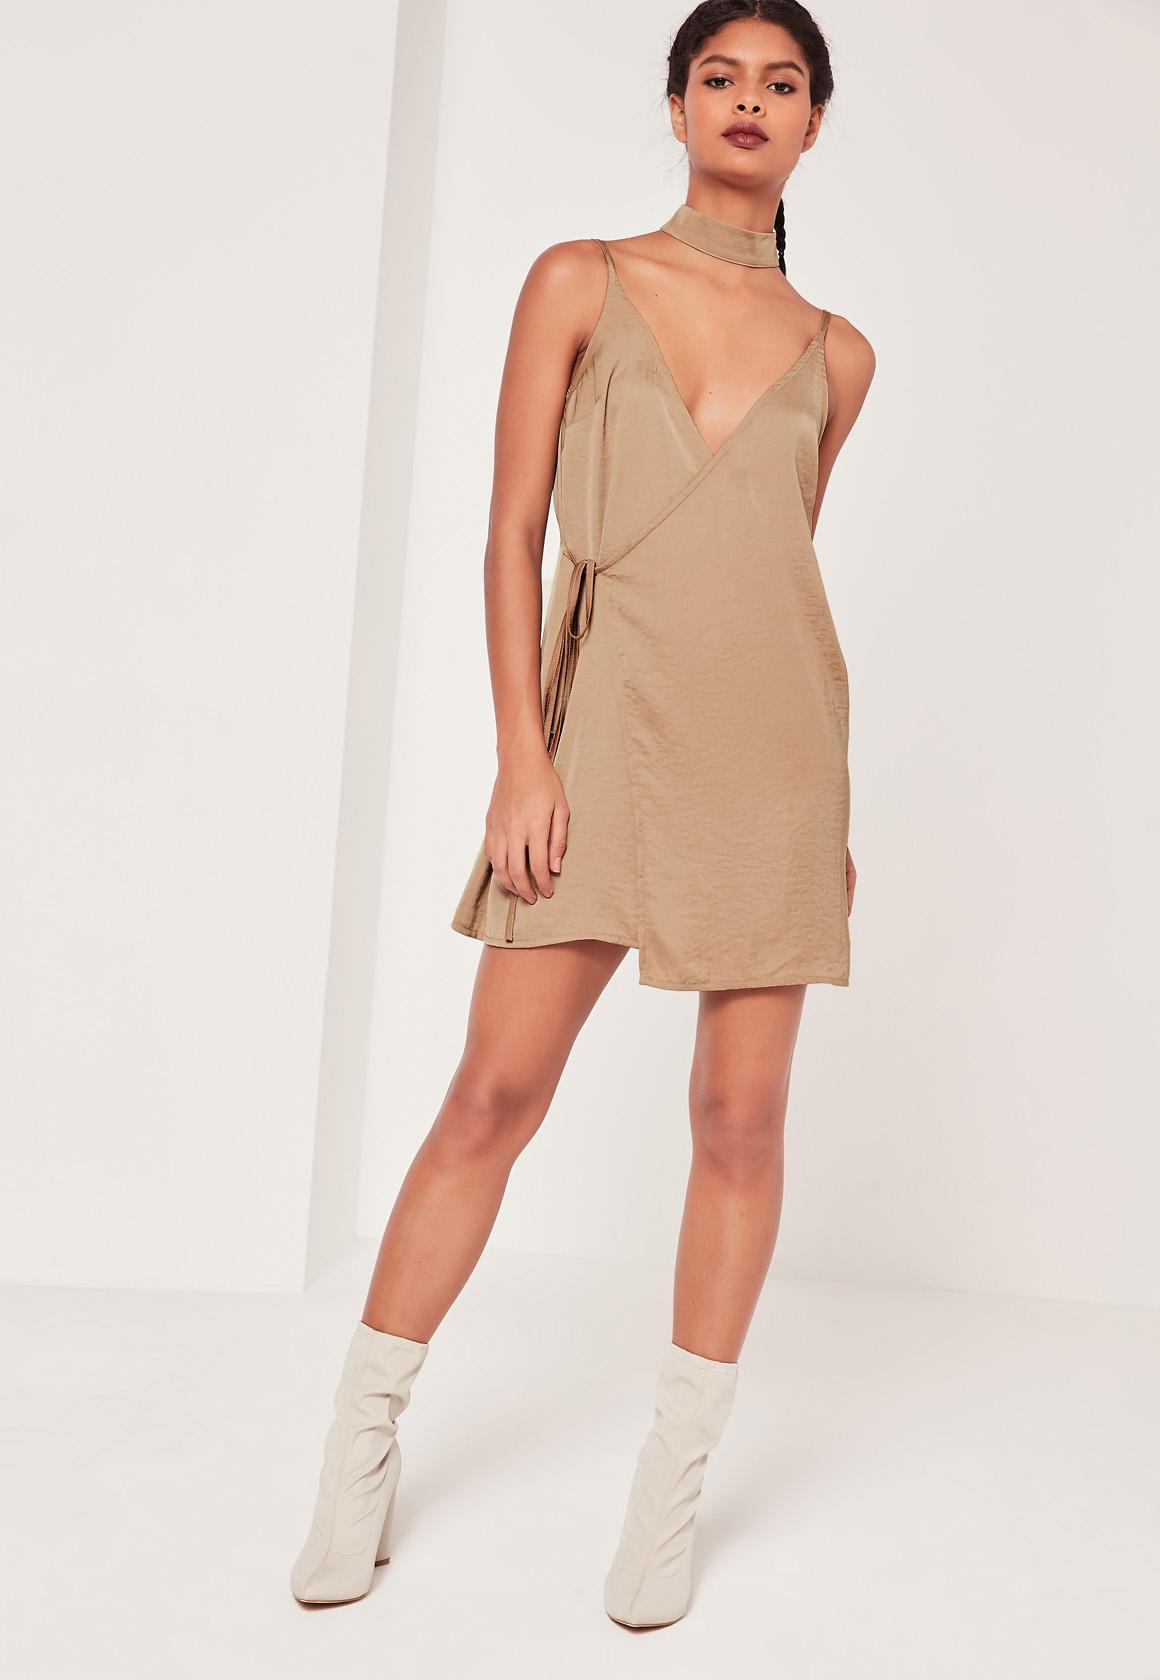 2 Piece Choker Silky Wrap Dress Nude